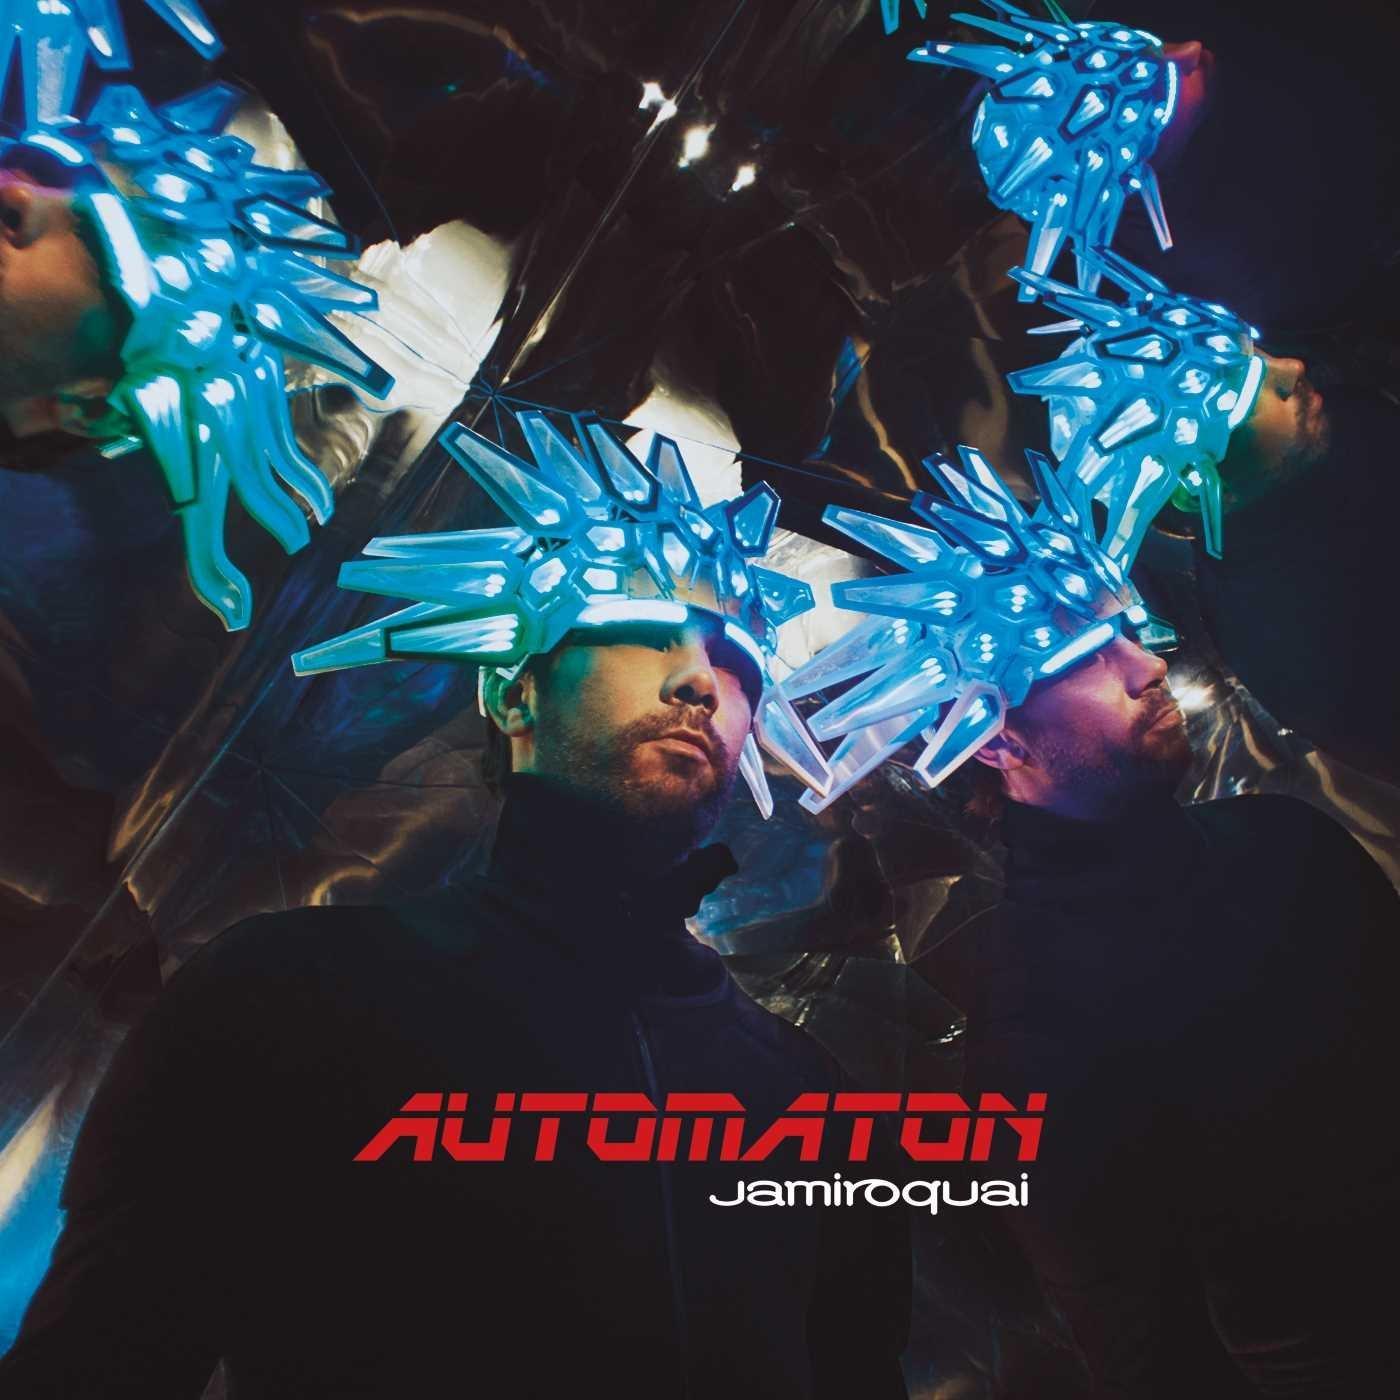 Jamiroquai- Automaton (Virgin EMI)